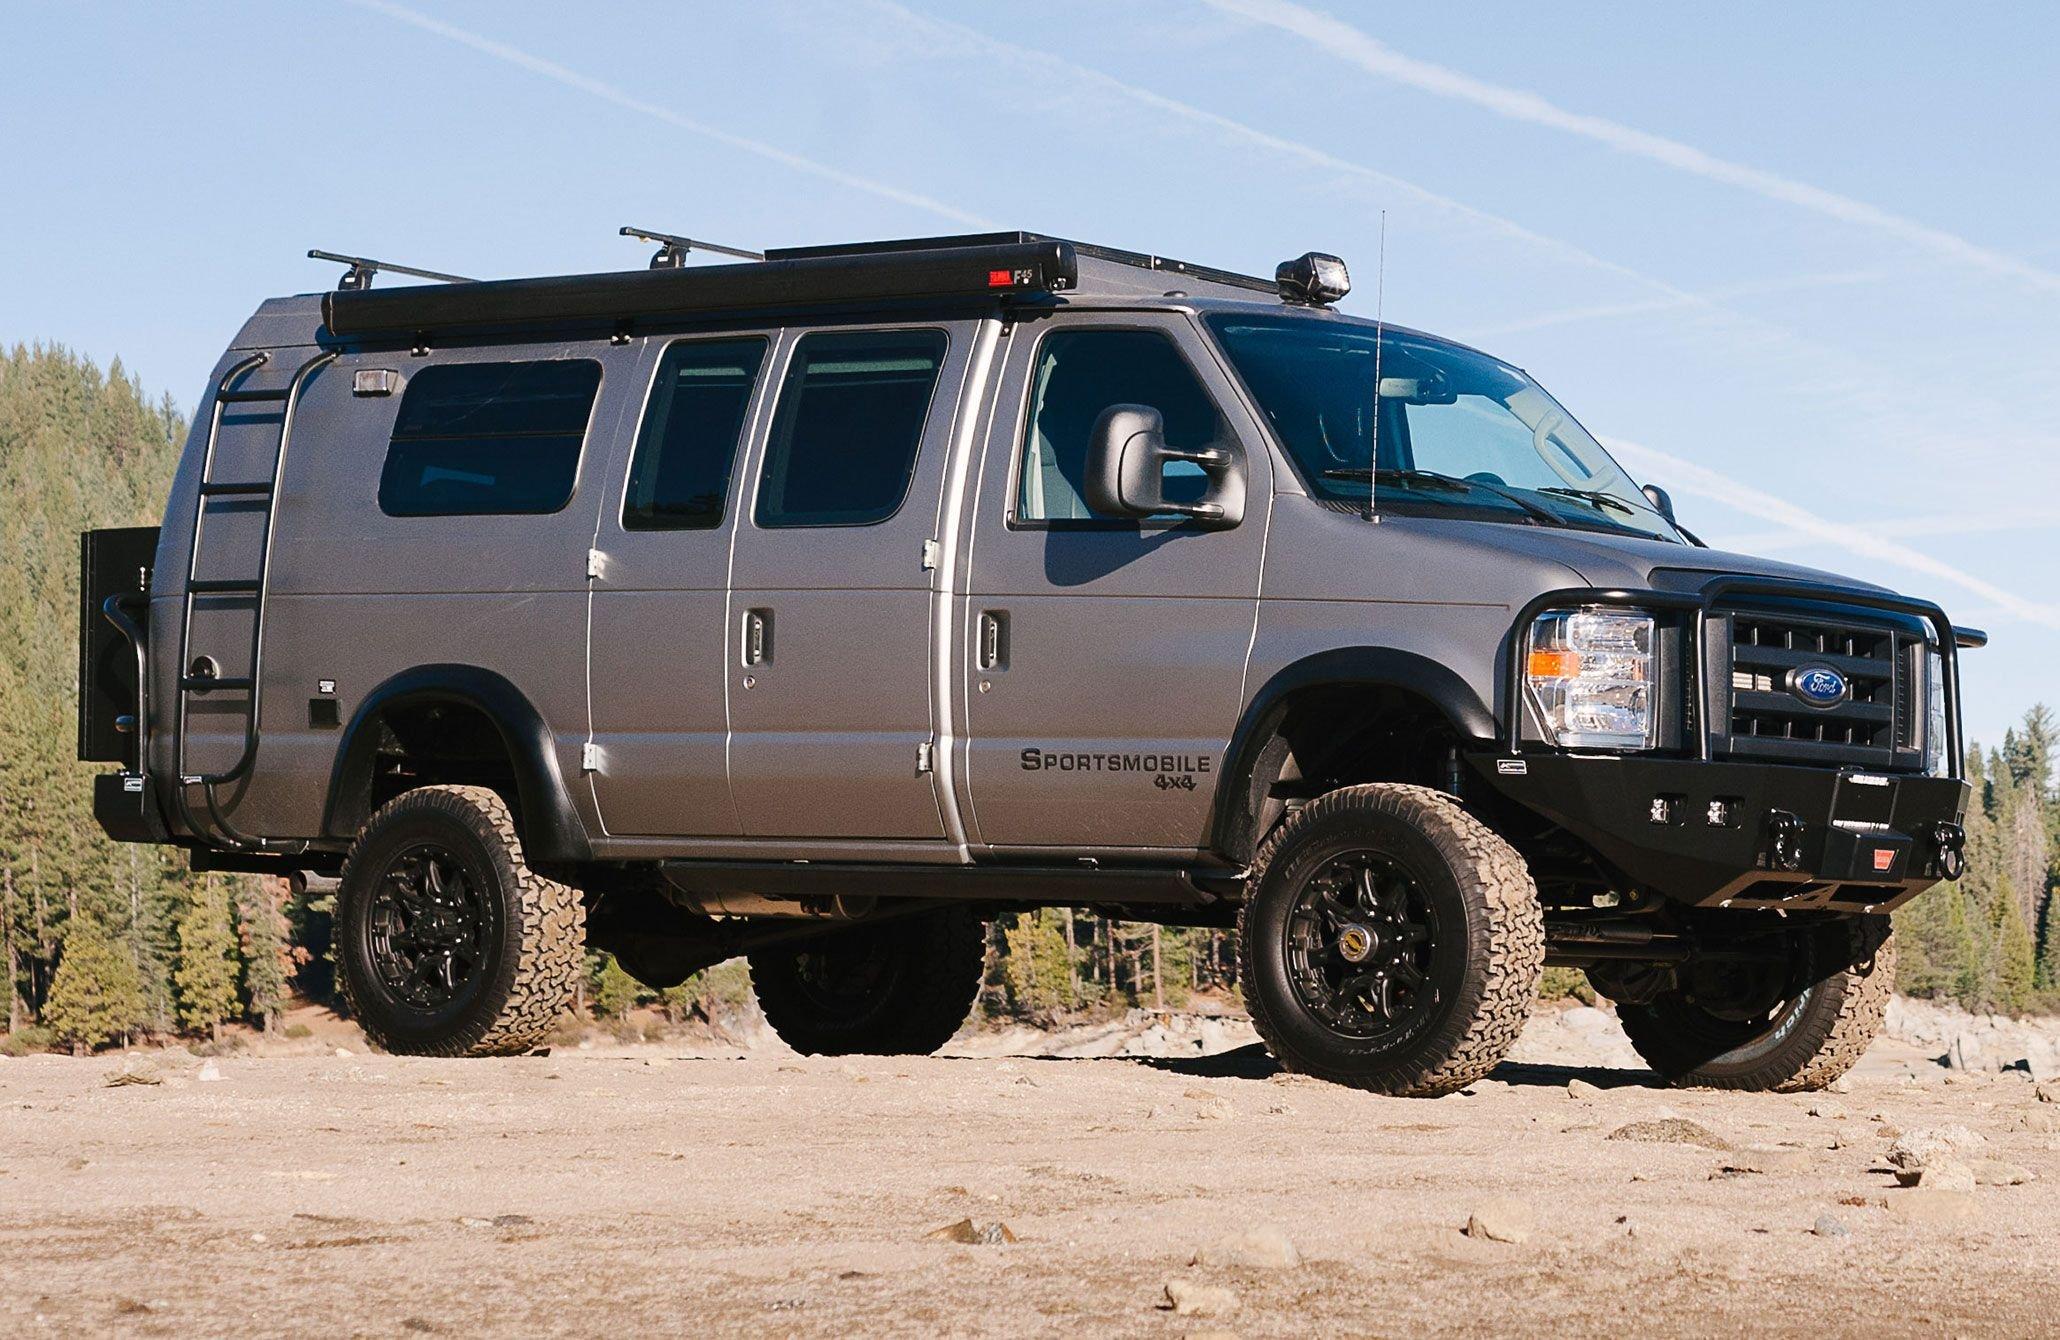 2015 sportsmobile ford e 350 van camper motorhome 4x4 f350 wallpaper 2060x1340 859745 wallpaperup